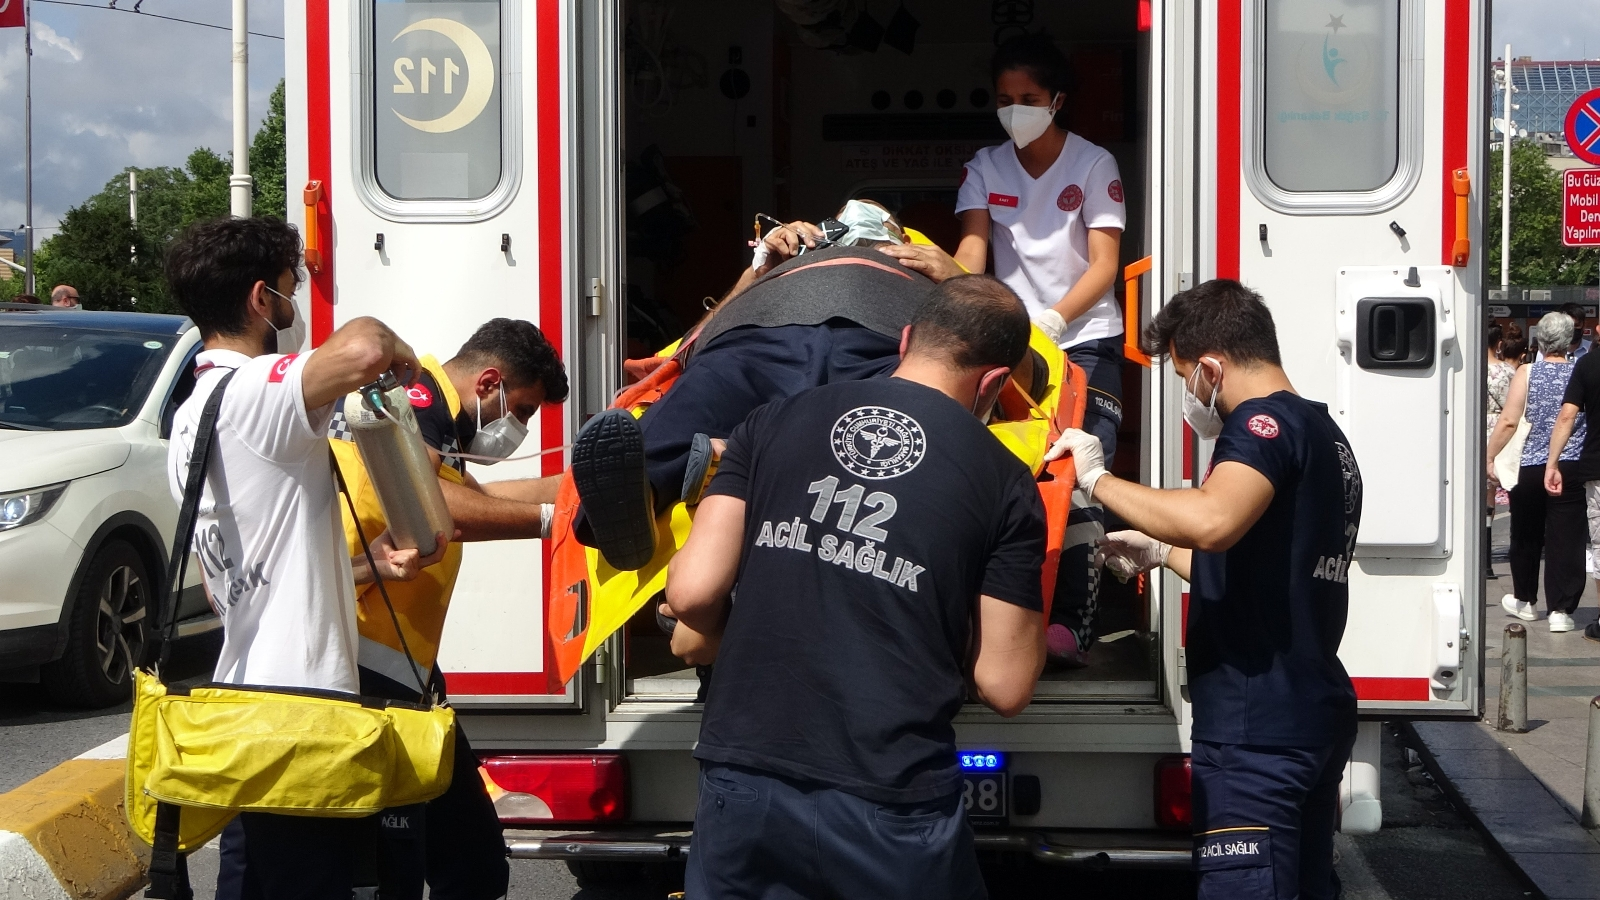 Covid-19 Hastası Kuveytli Turist Konakladığı Oteli Alarma Geçirdi